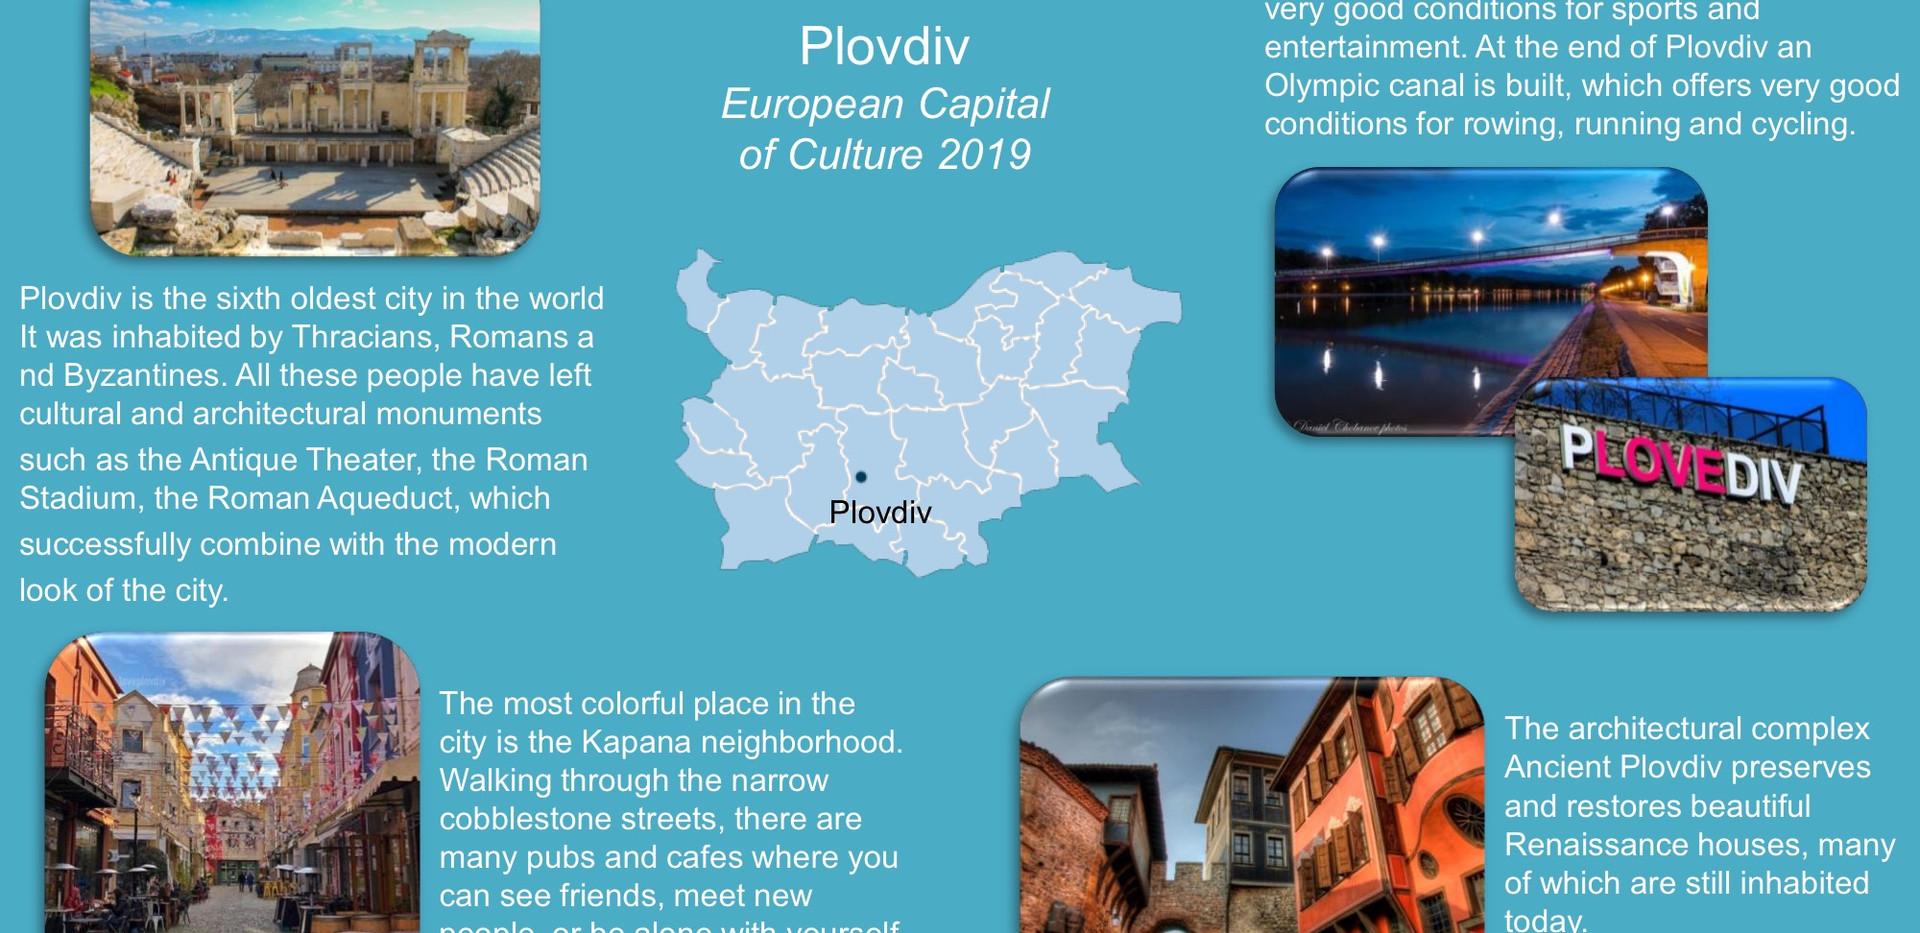 EVP_Plovdiv2019 (1) 3 1_9_2019.jpeg